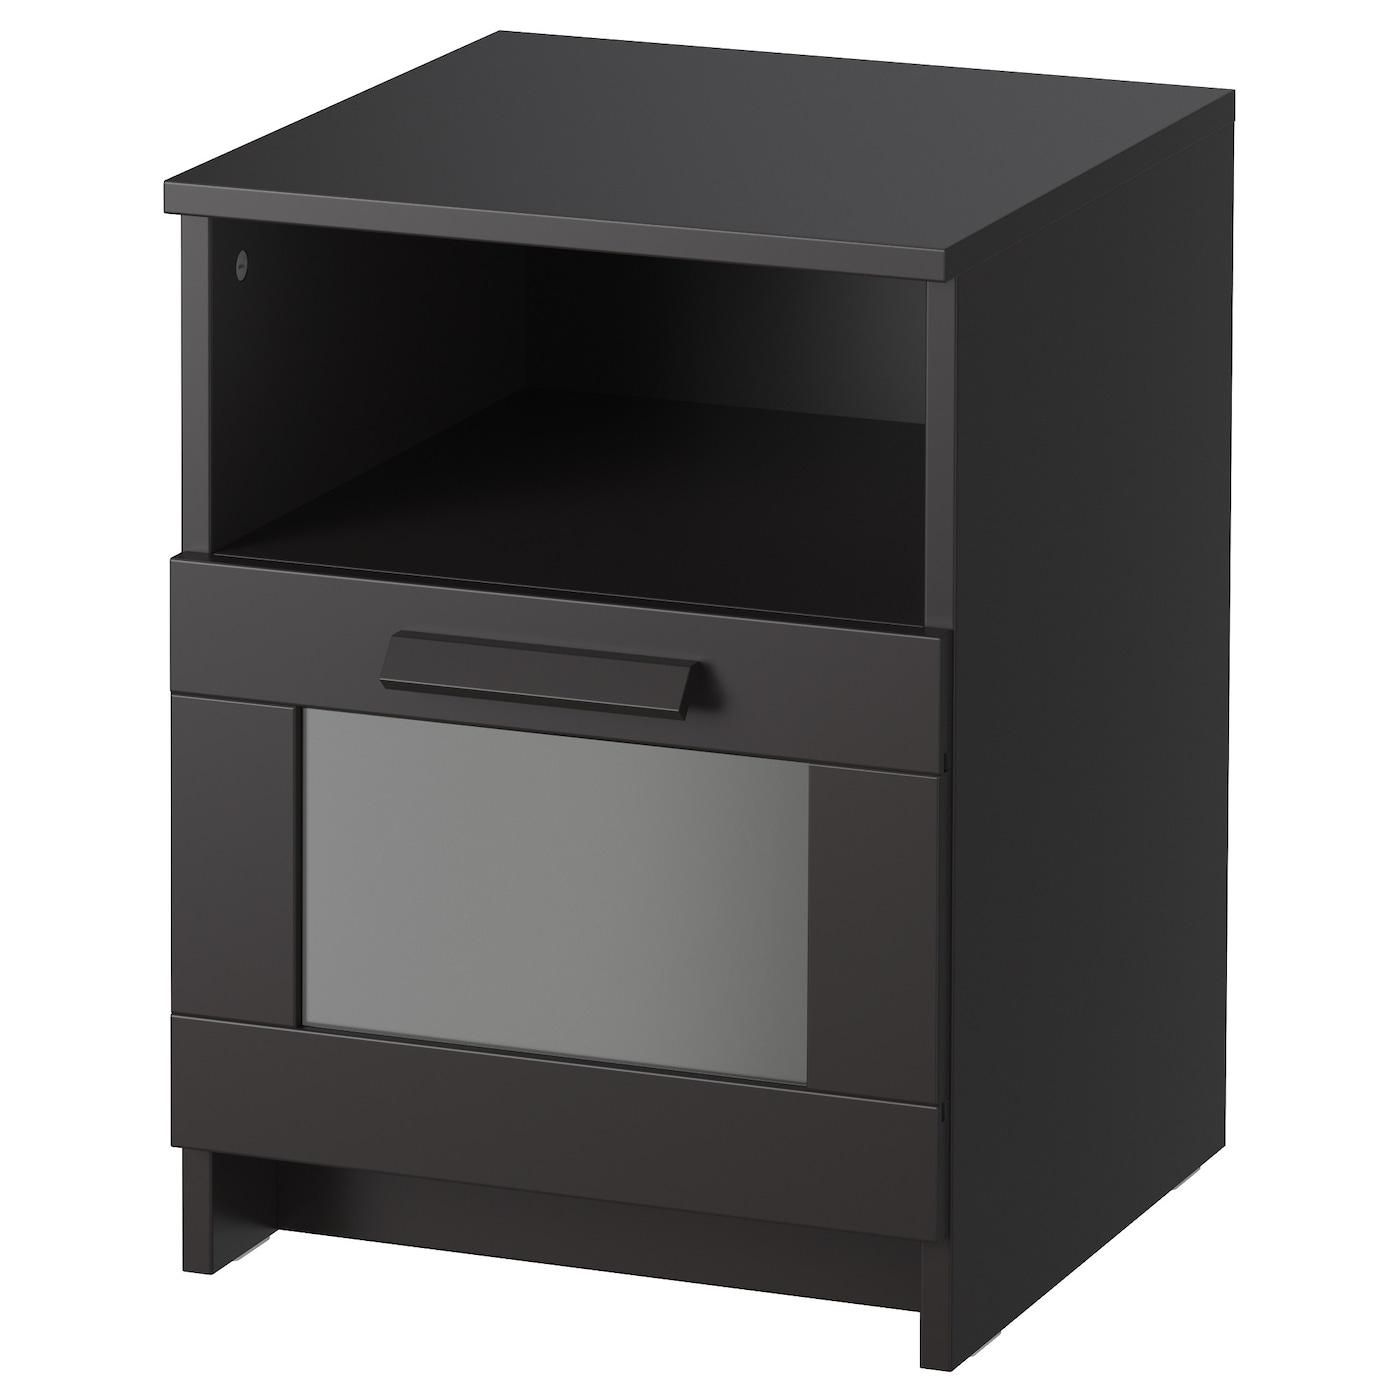 Brimnes nachtkastje zwart 39 x 41 cm ikea for Mesillas de noche 30 cm